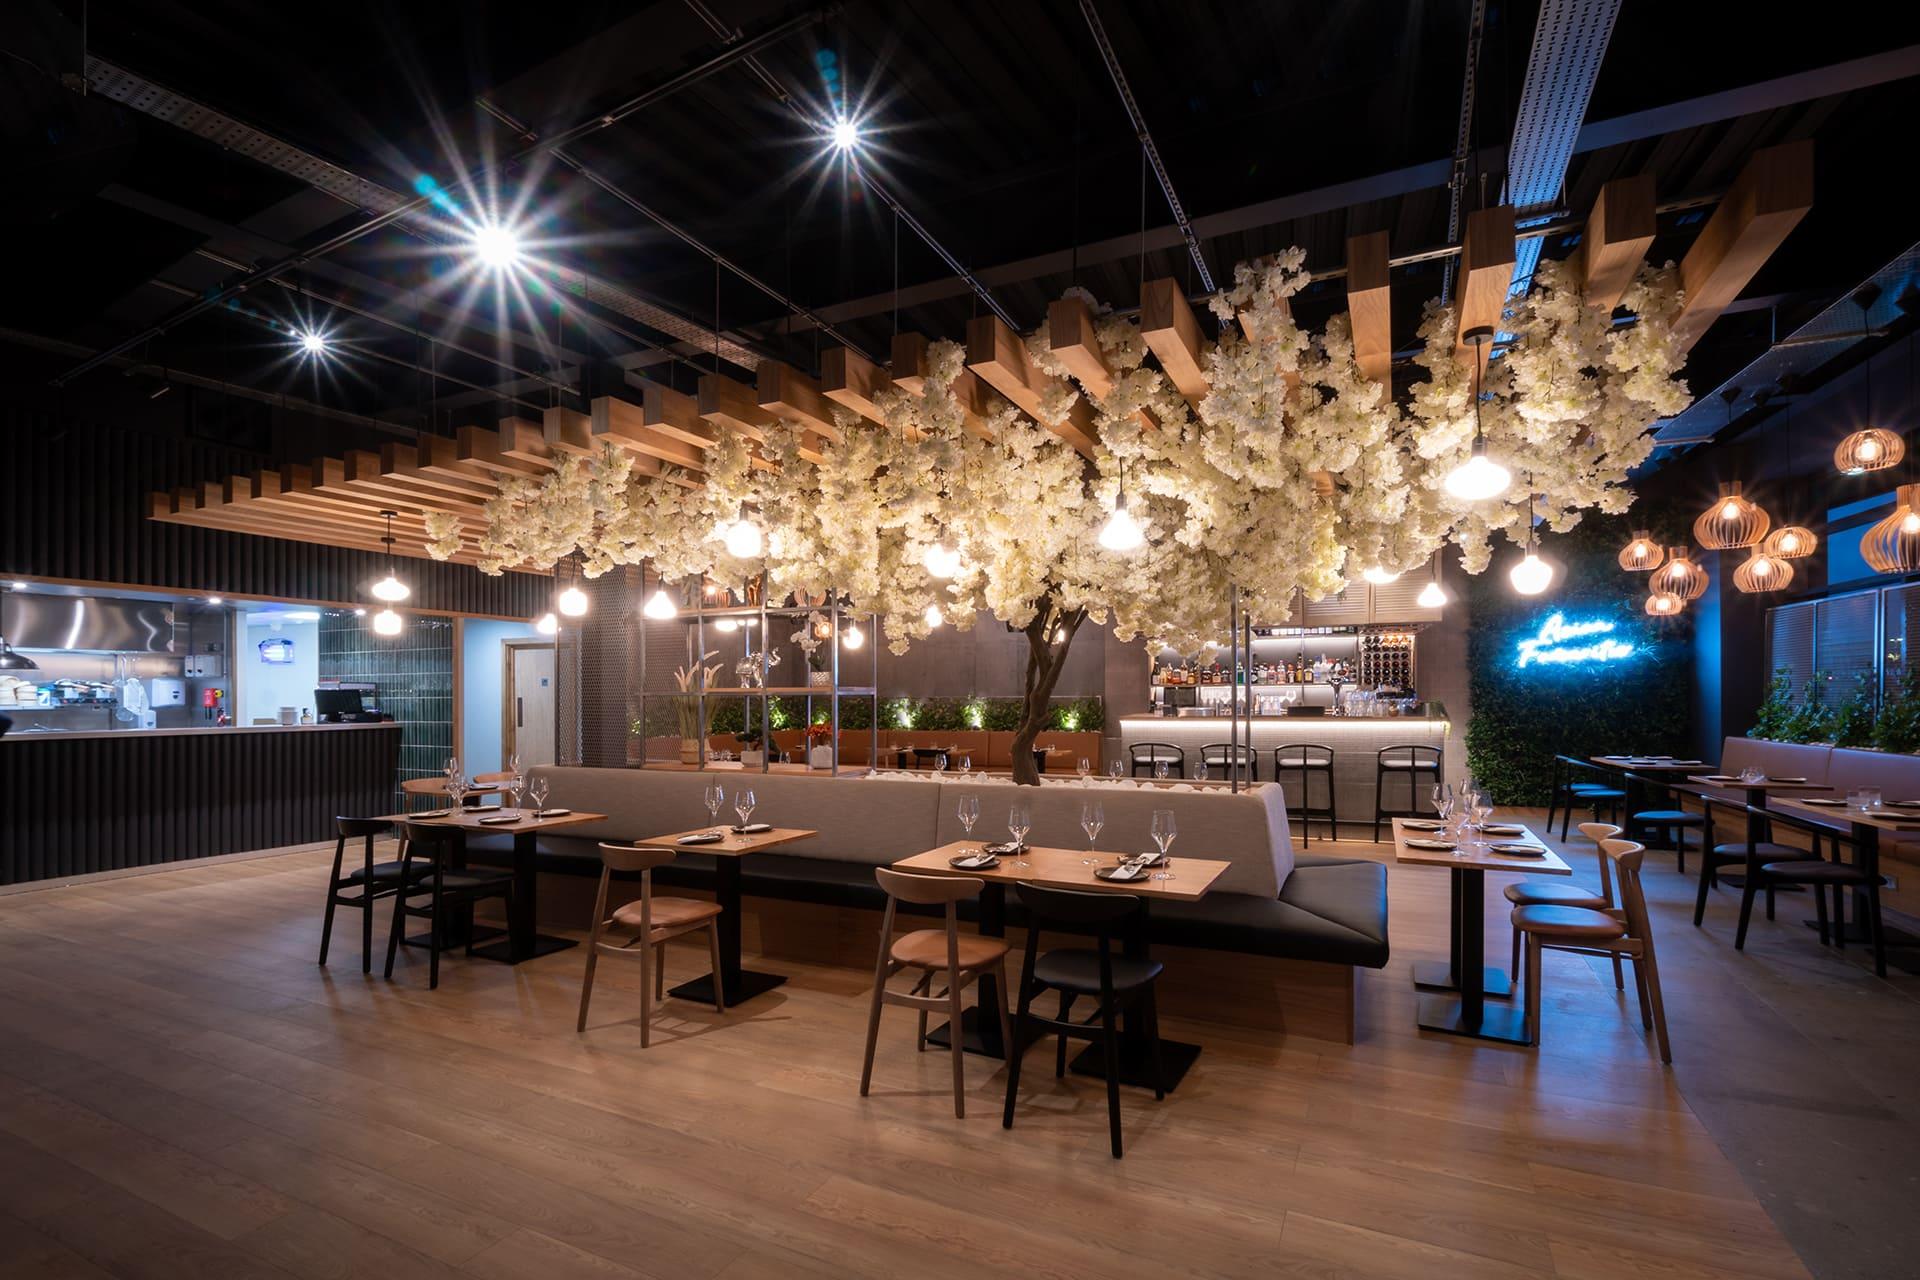 Asian Restaurant Interior Design Concept by Prosper